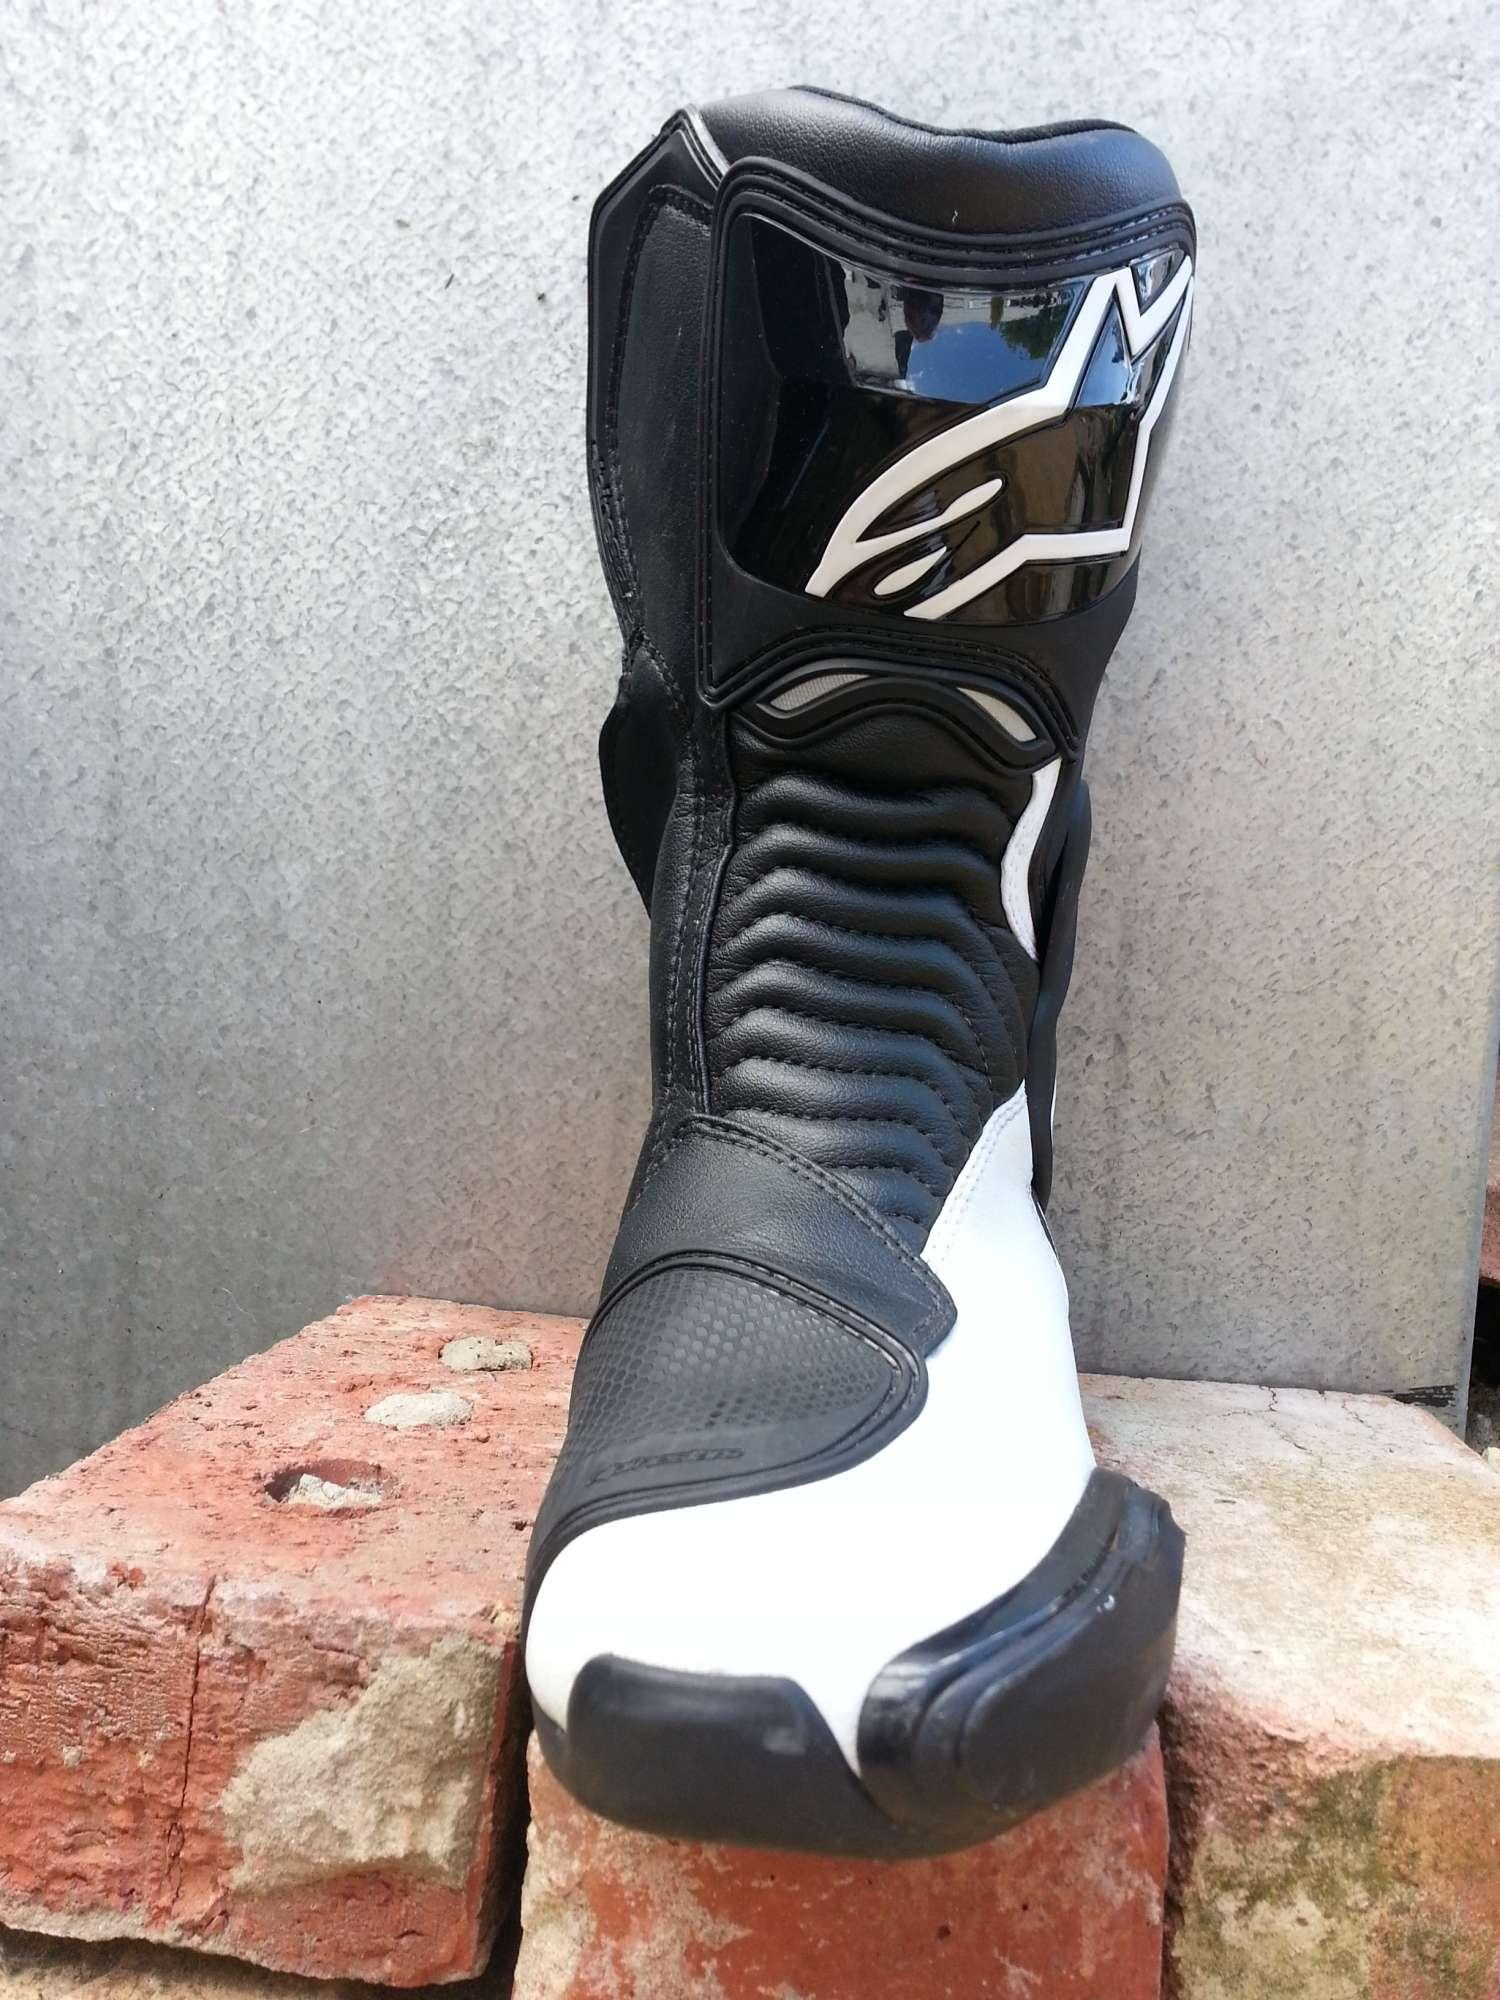 alpinestars-smx6-boots-front